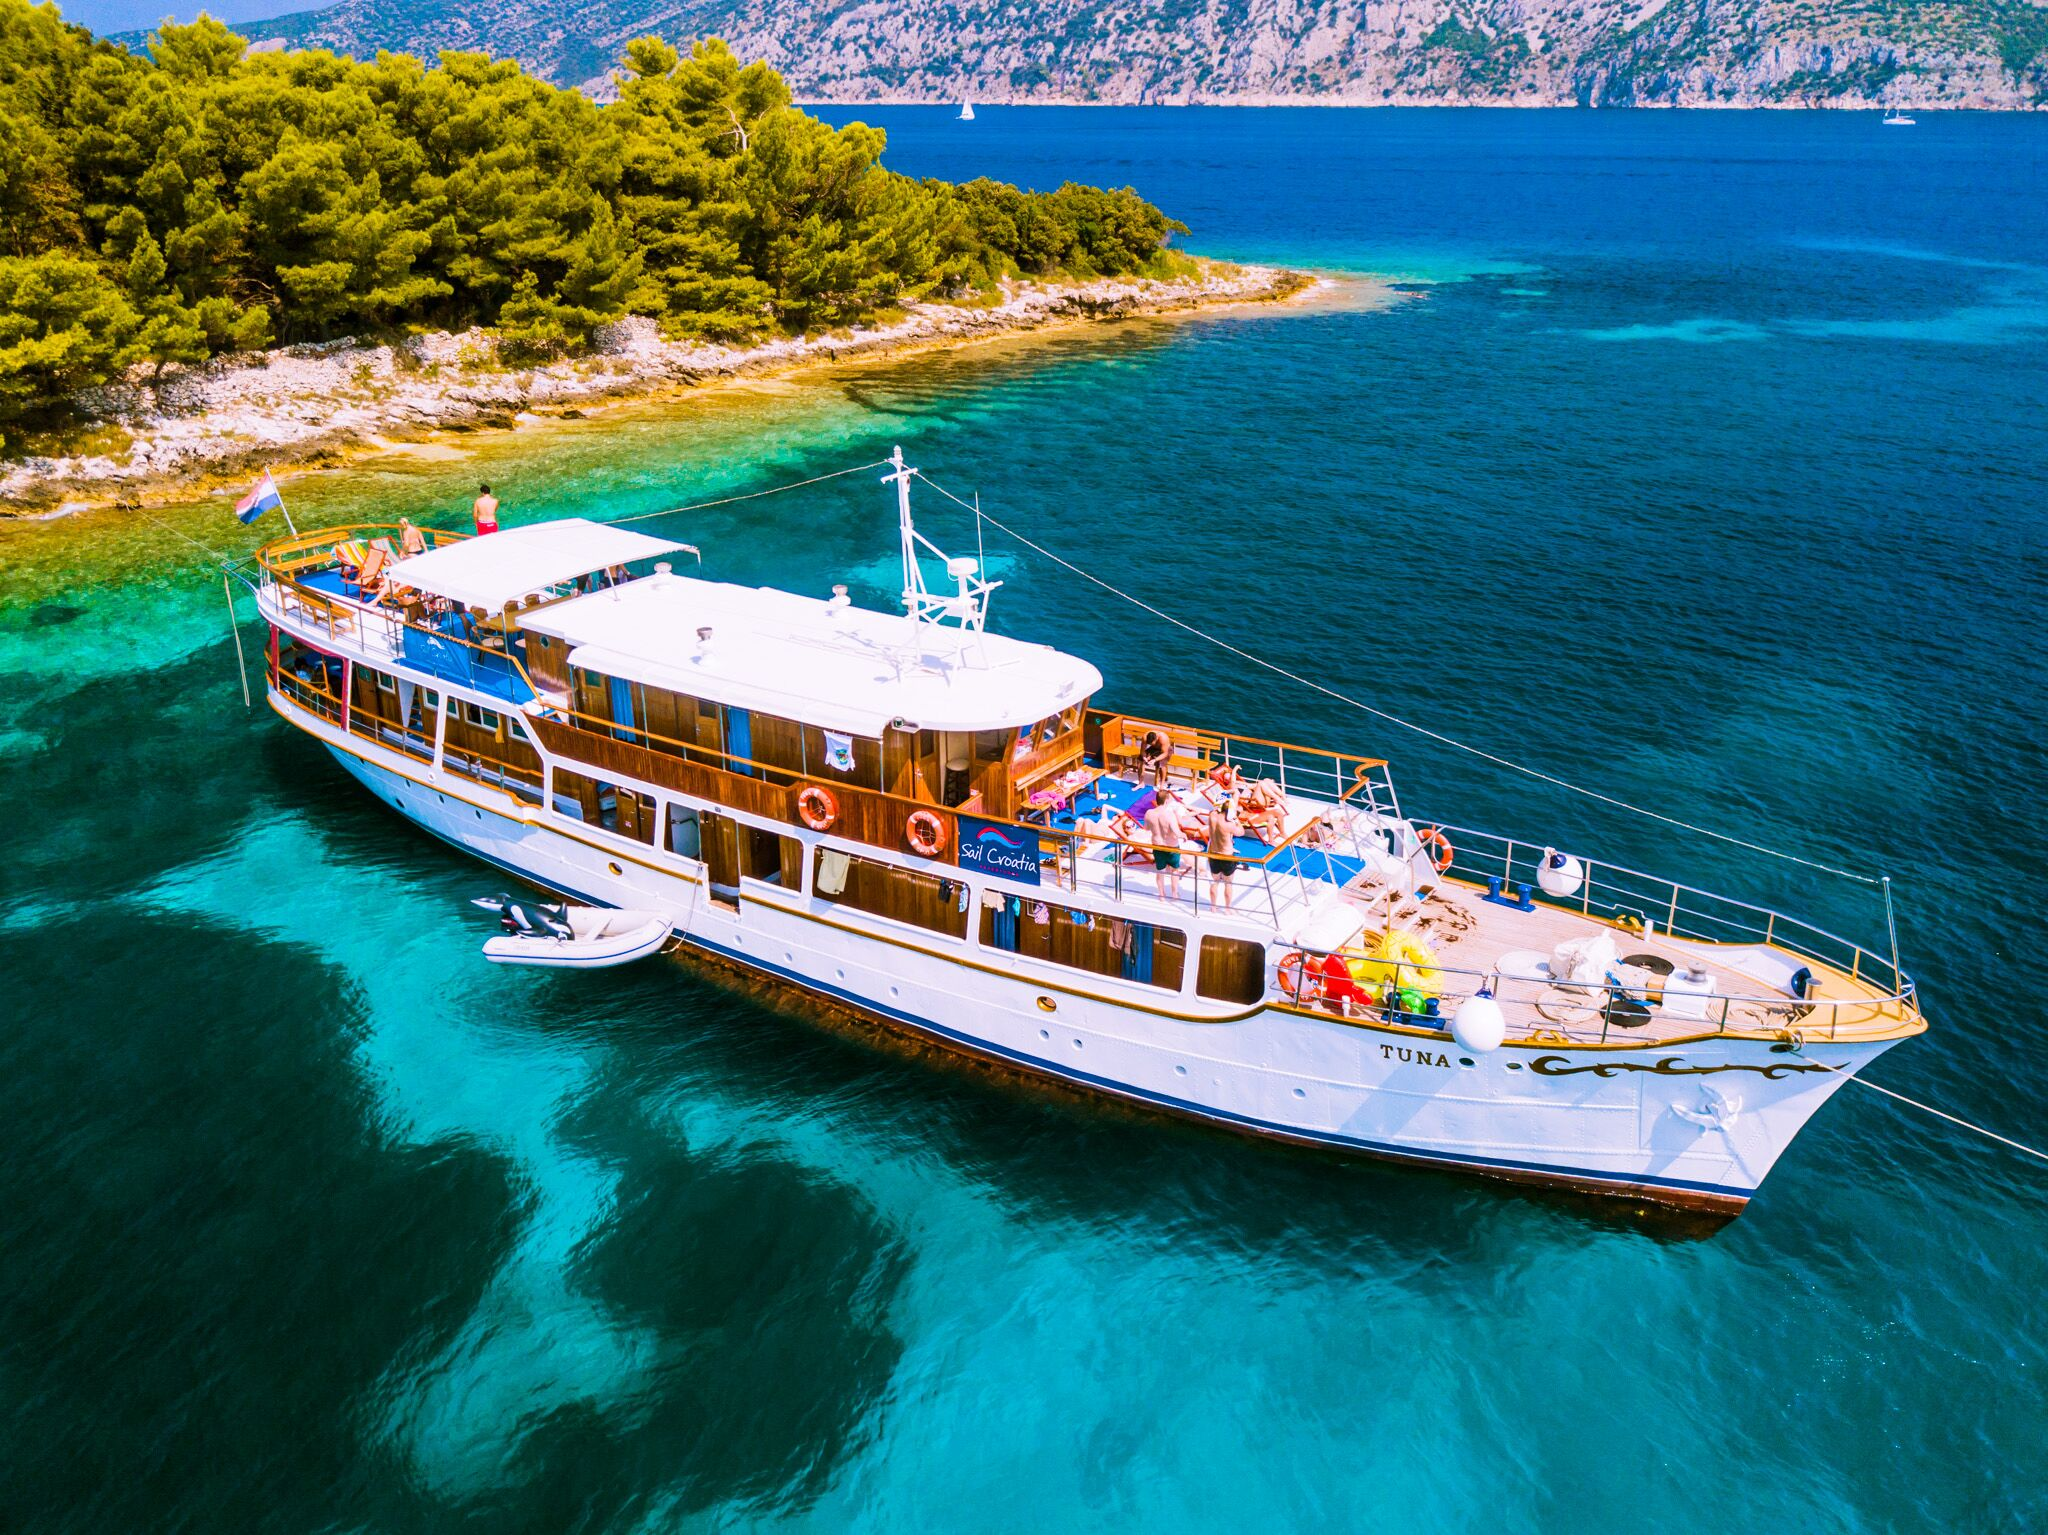 DamselTours Sail Croatia Women's Tour August 15-21, 2020